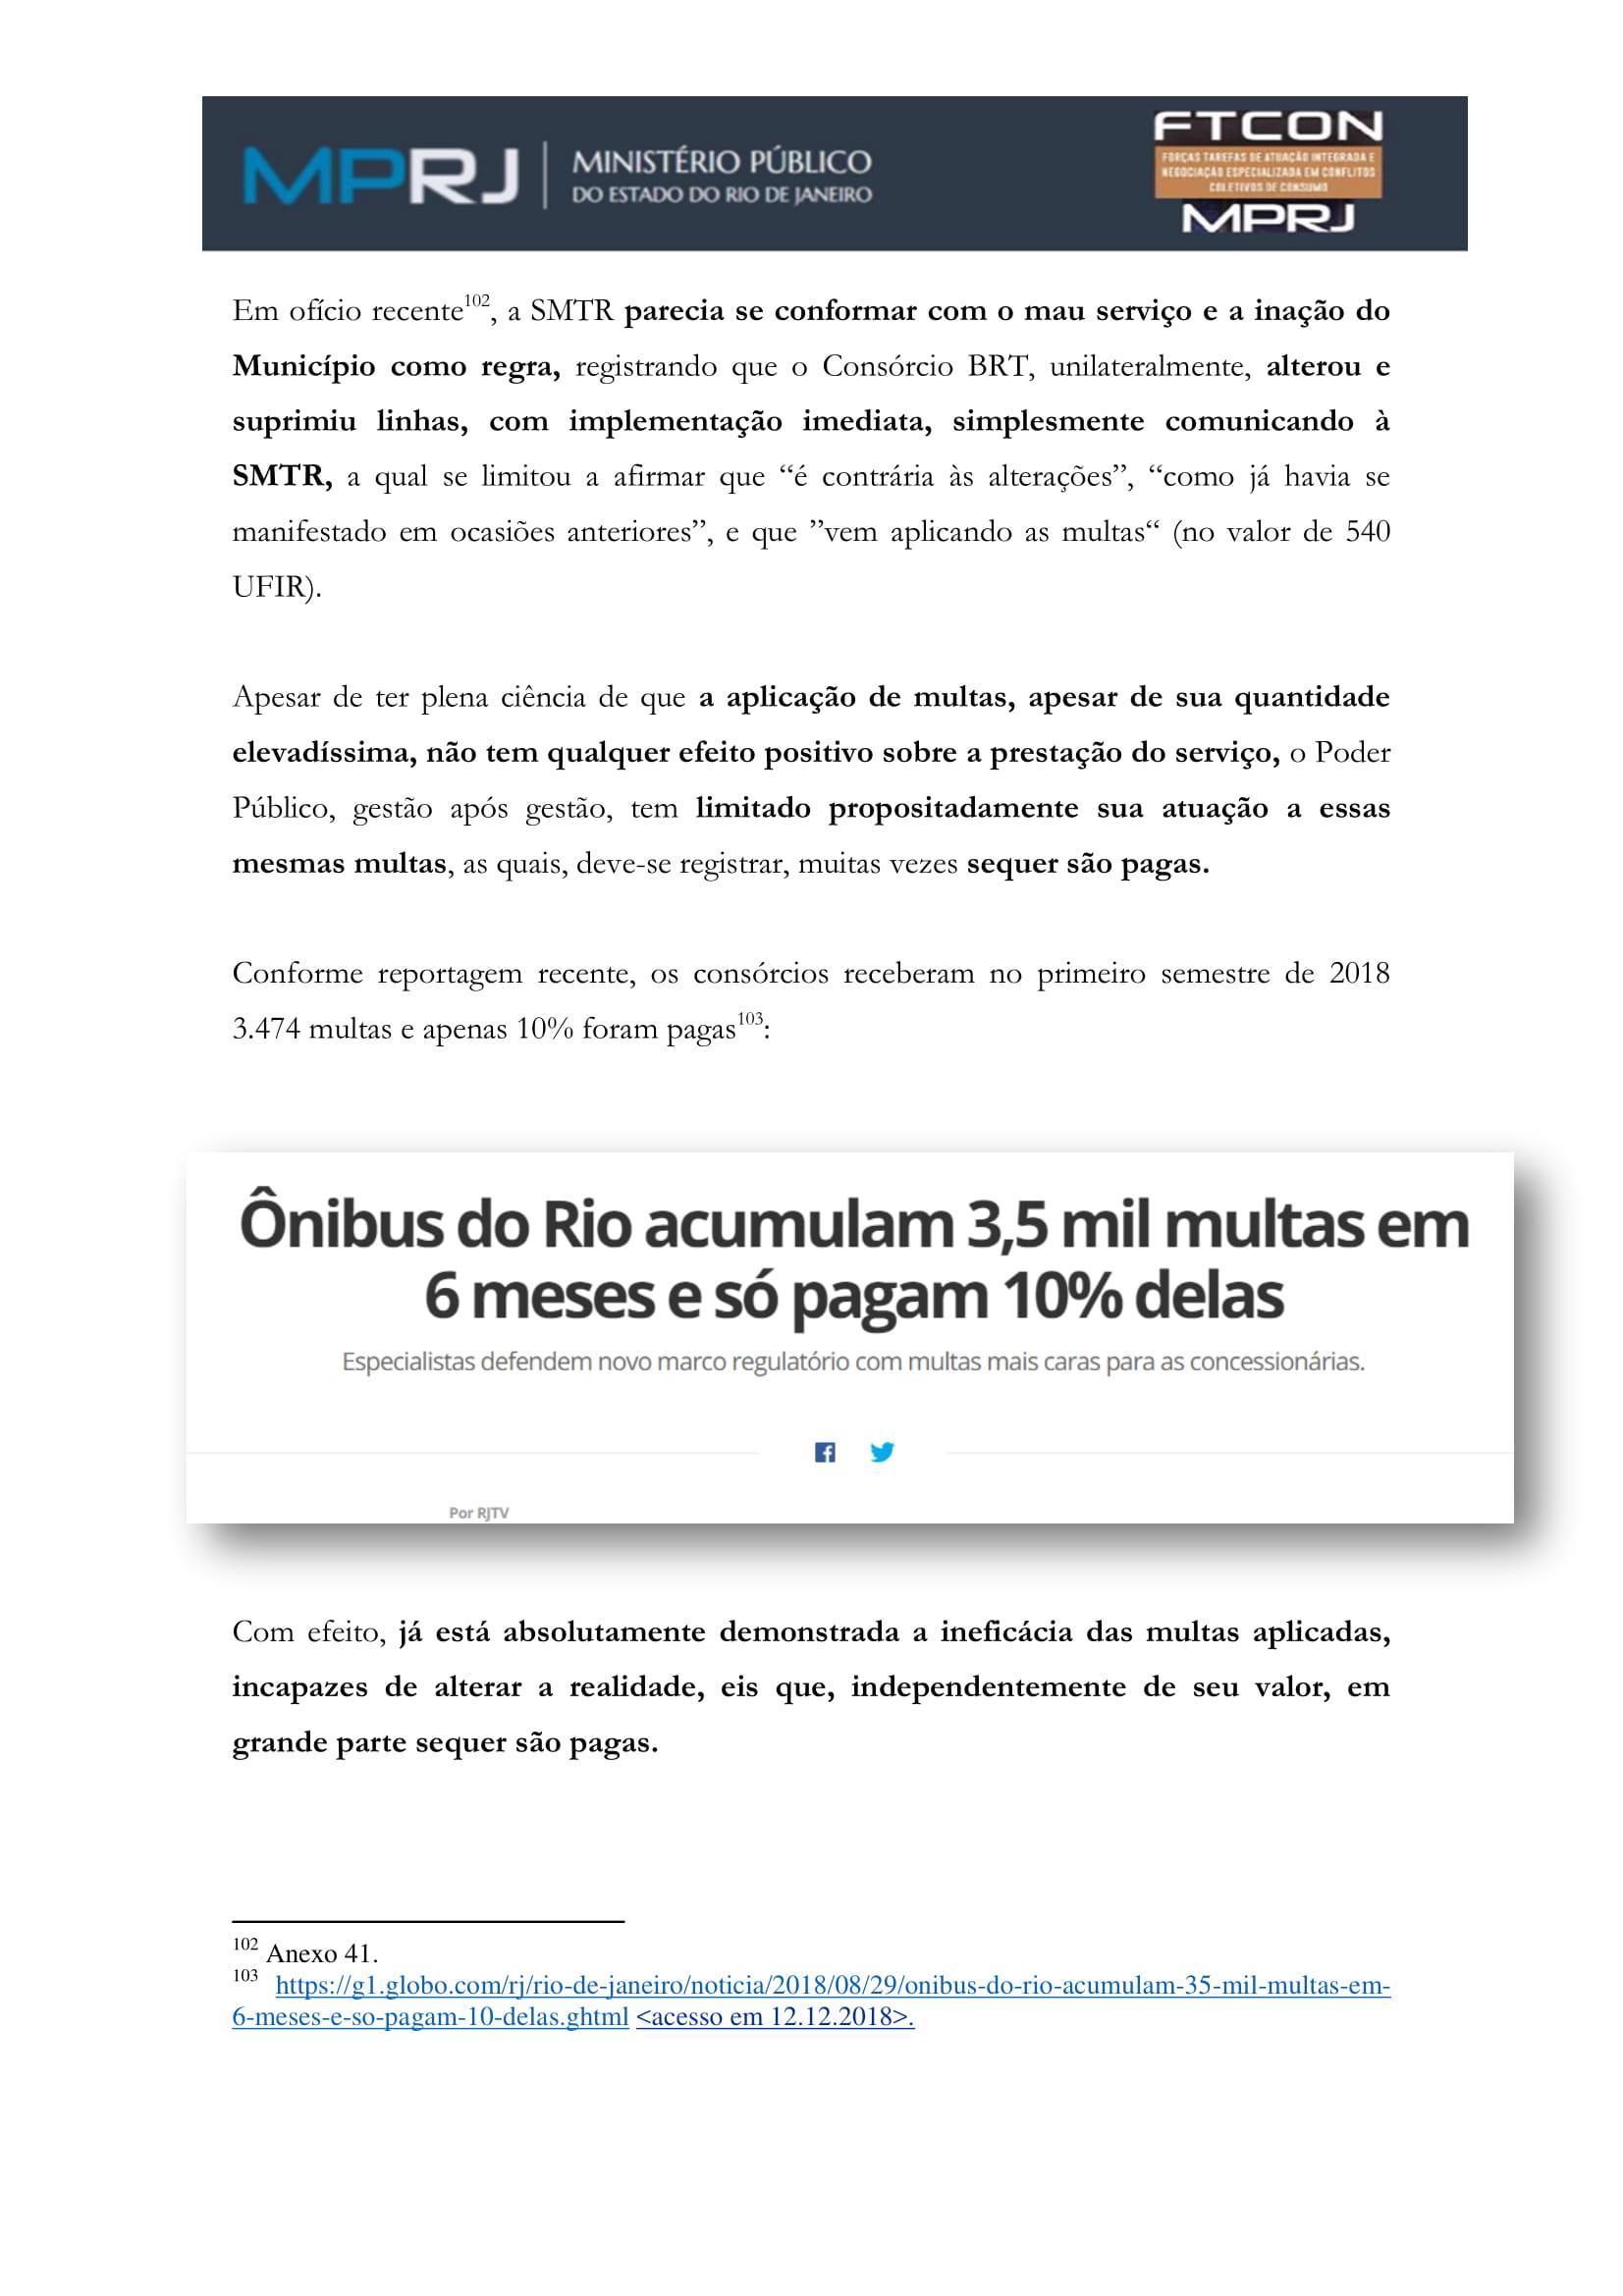 acp_caducidade_onibus_dr_rt-111